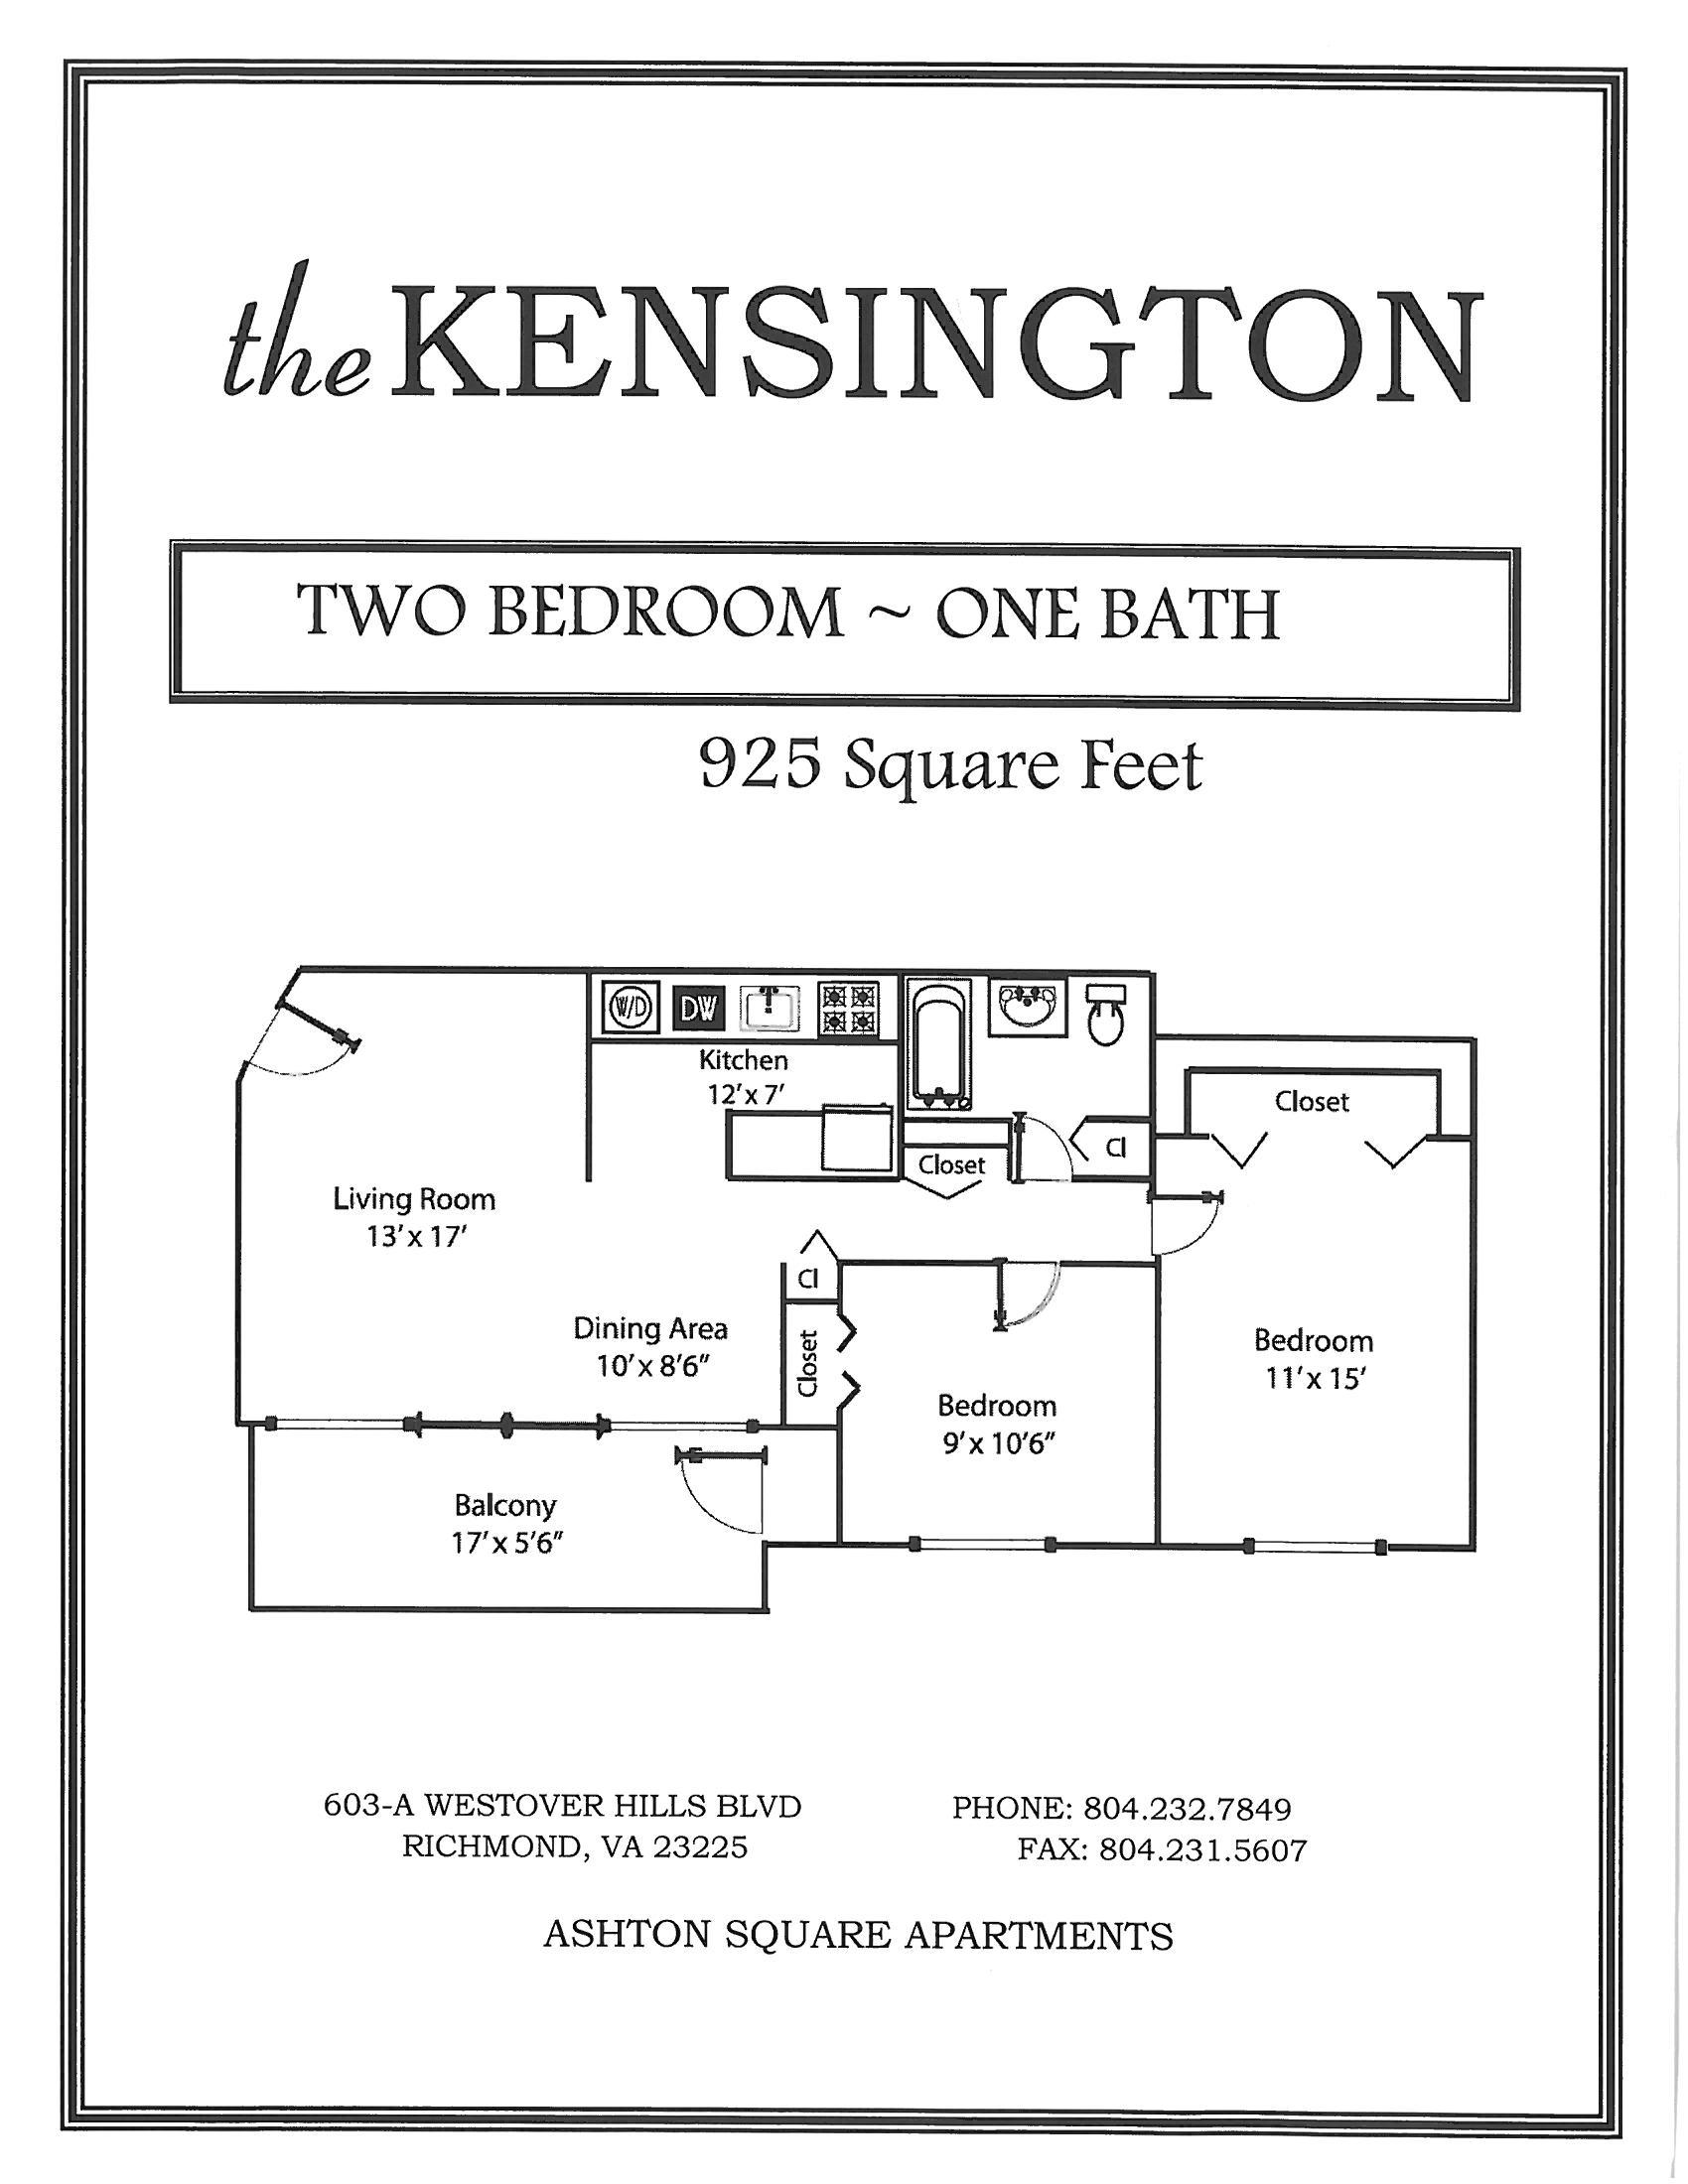 The Kensington 2 Bedroom 1 Bath Floor Plan at Ashton Square Apartments